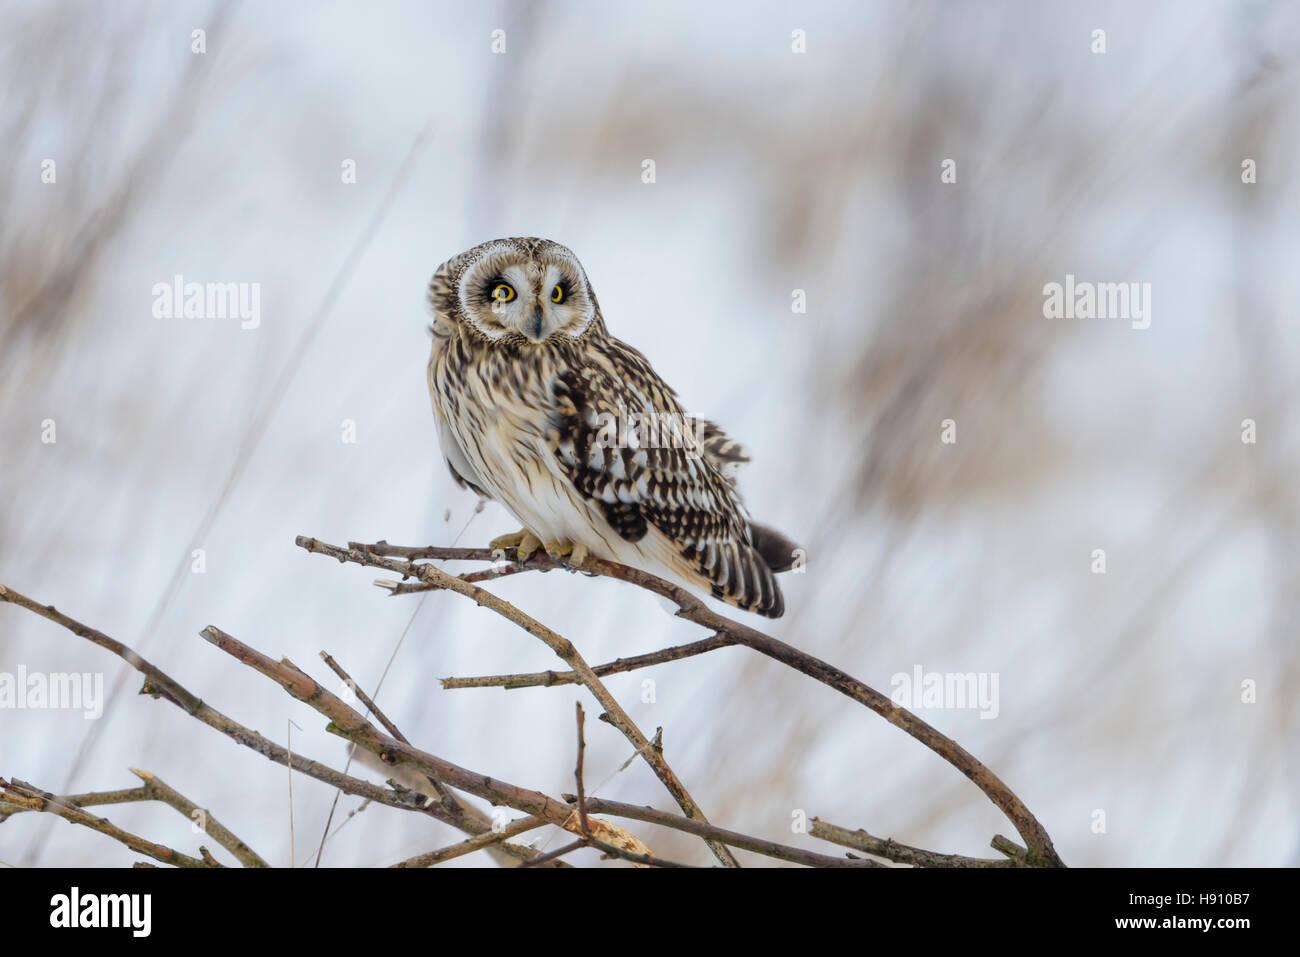 Sumpfohreule, Asio flammeus, Wild Short Eared Owl in winter snow - Stock Image